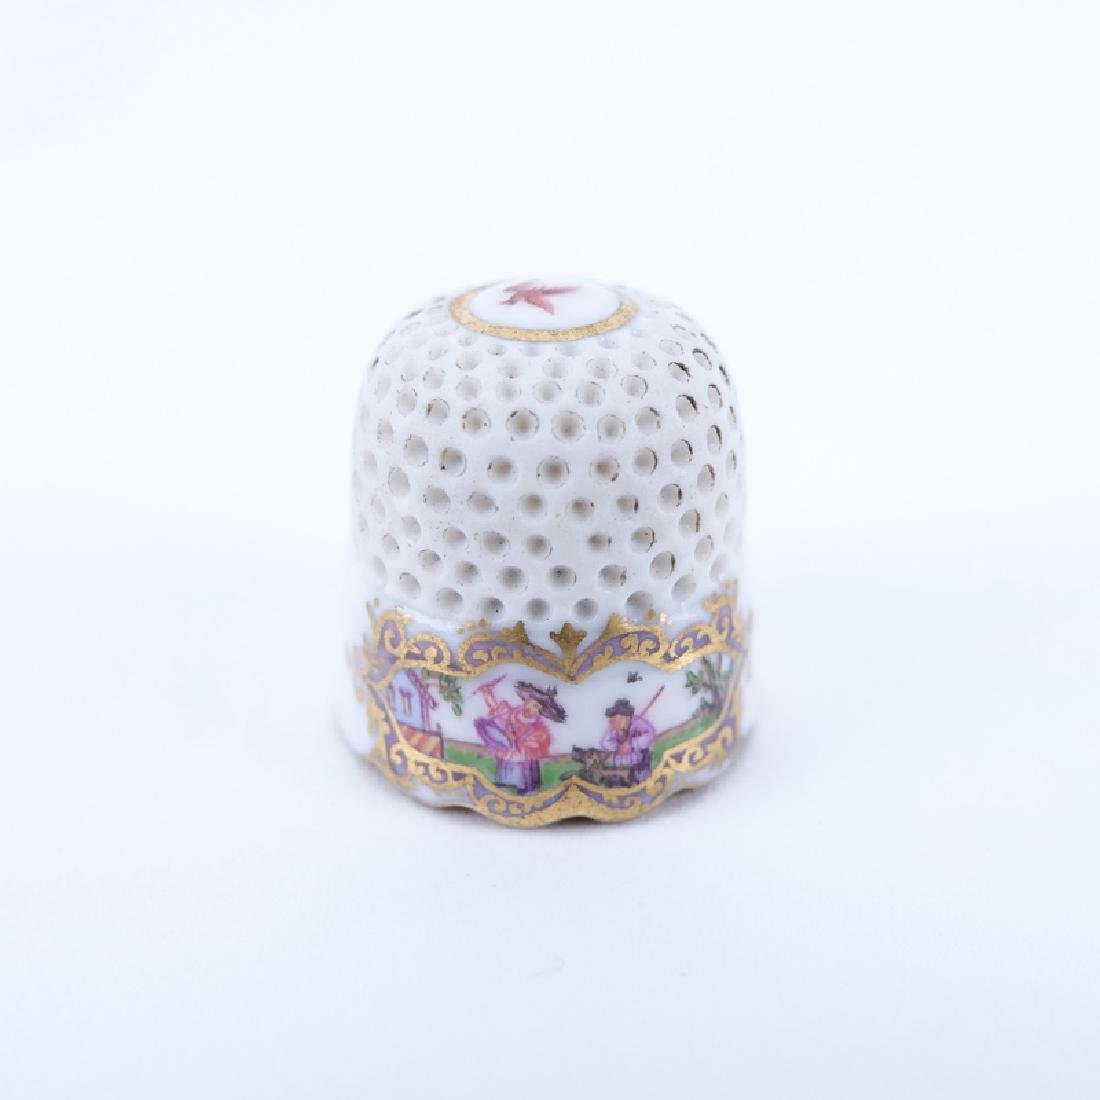 Mid 18th Century Meissen Porcelain Thimble. The upper